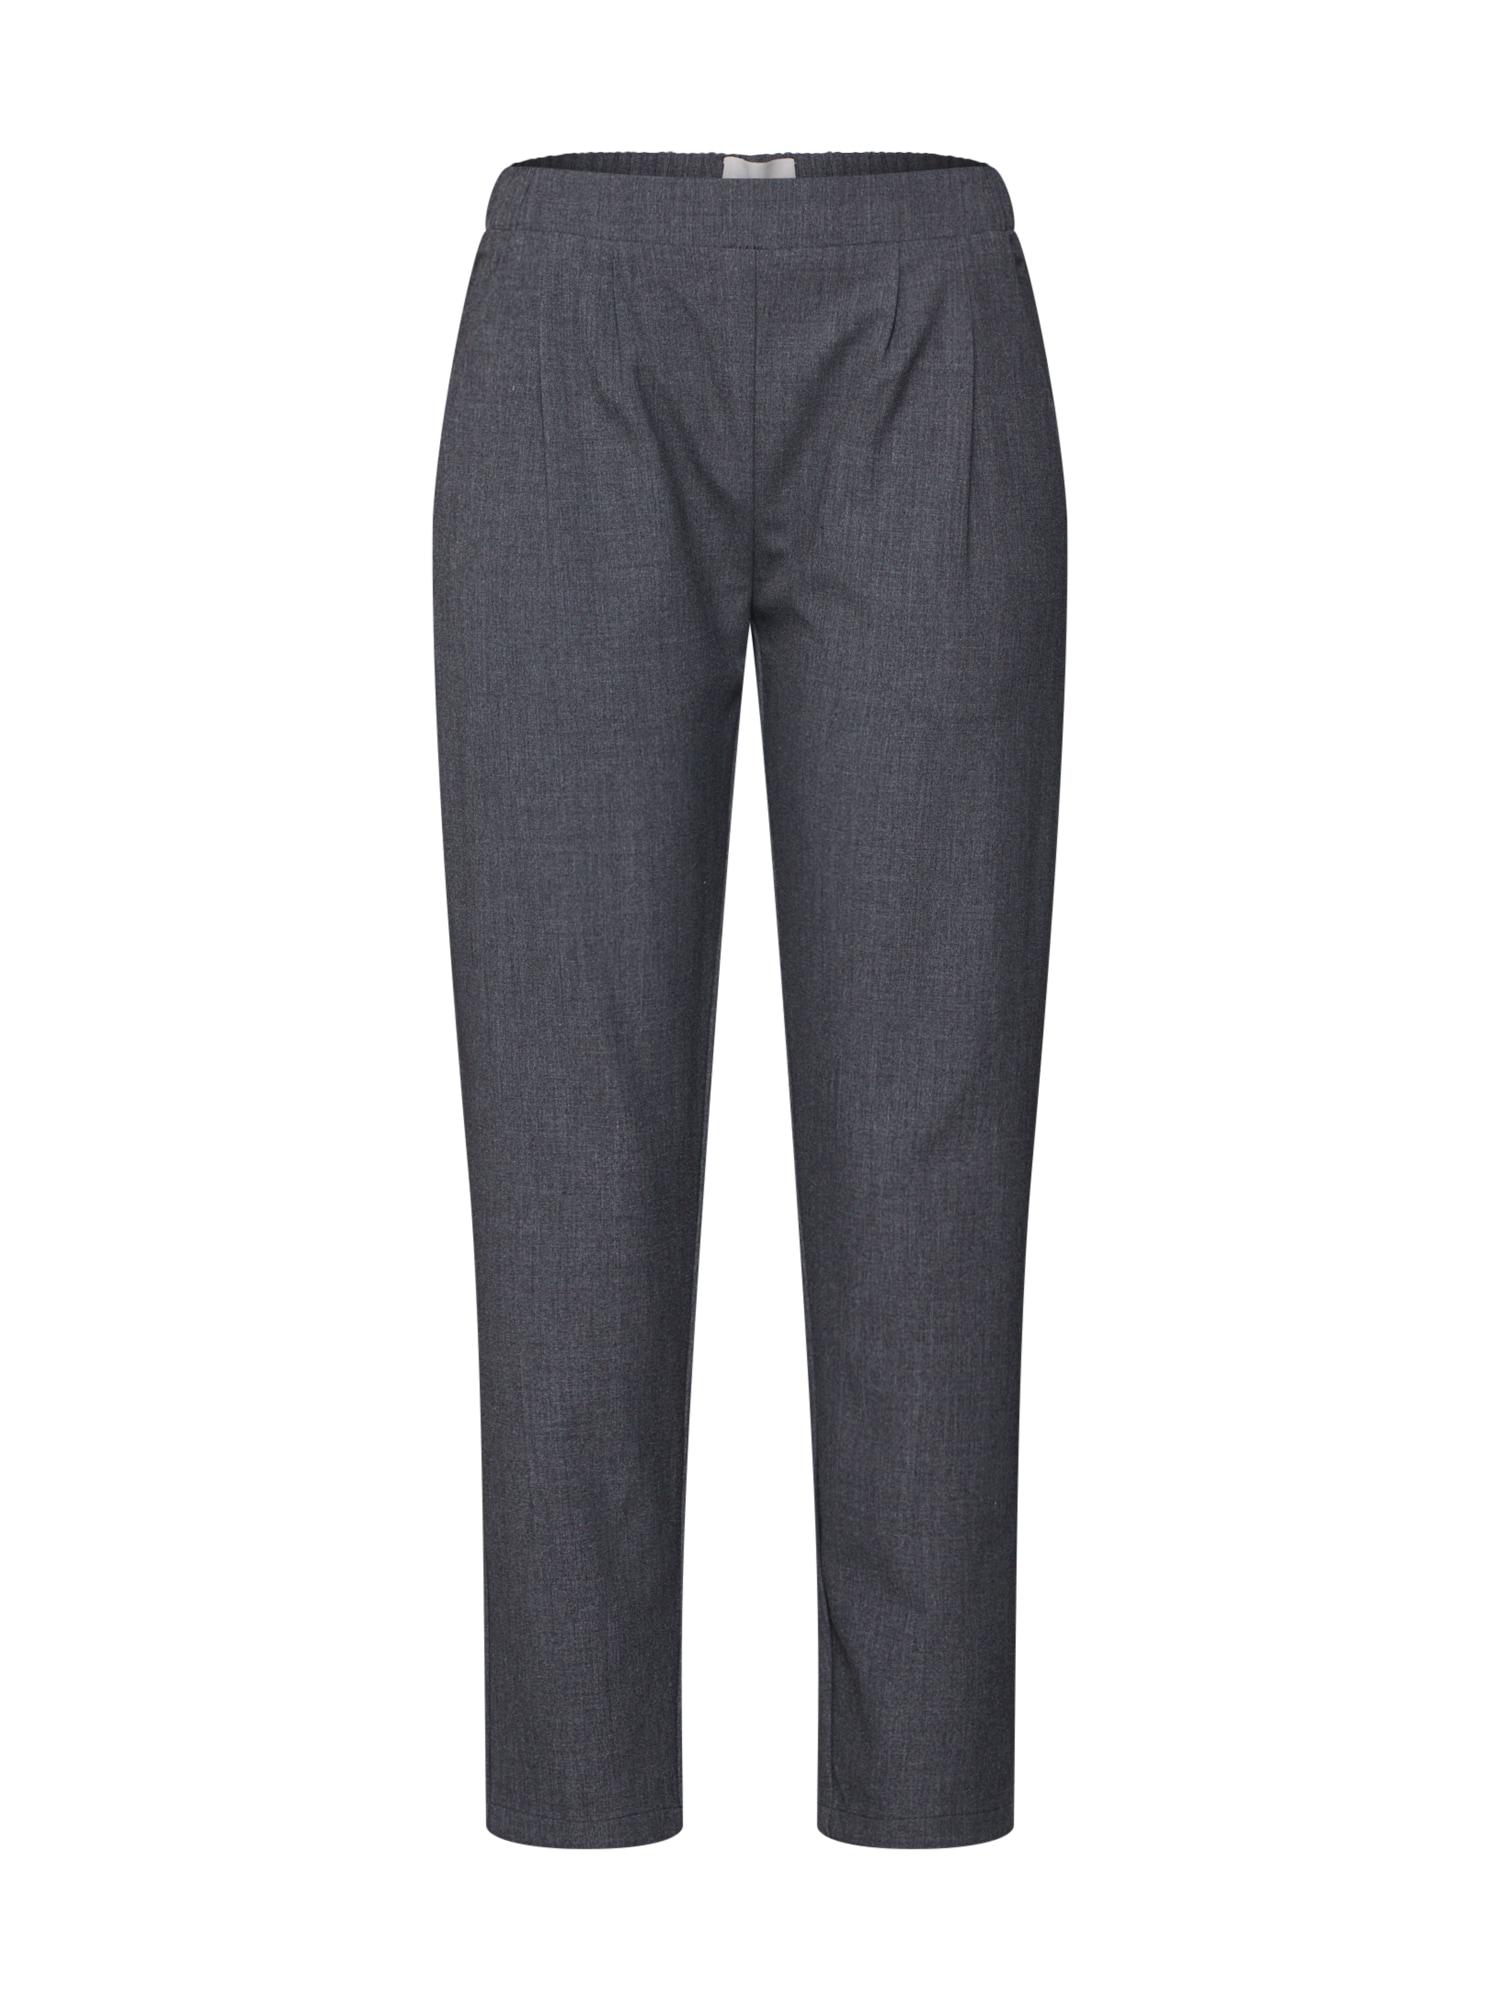 Kalhoty se sklady v pase Sofja tmavě šedá Minimum